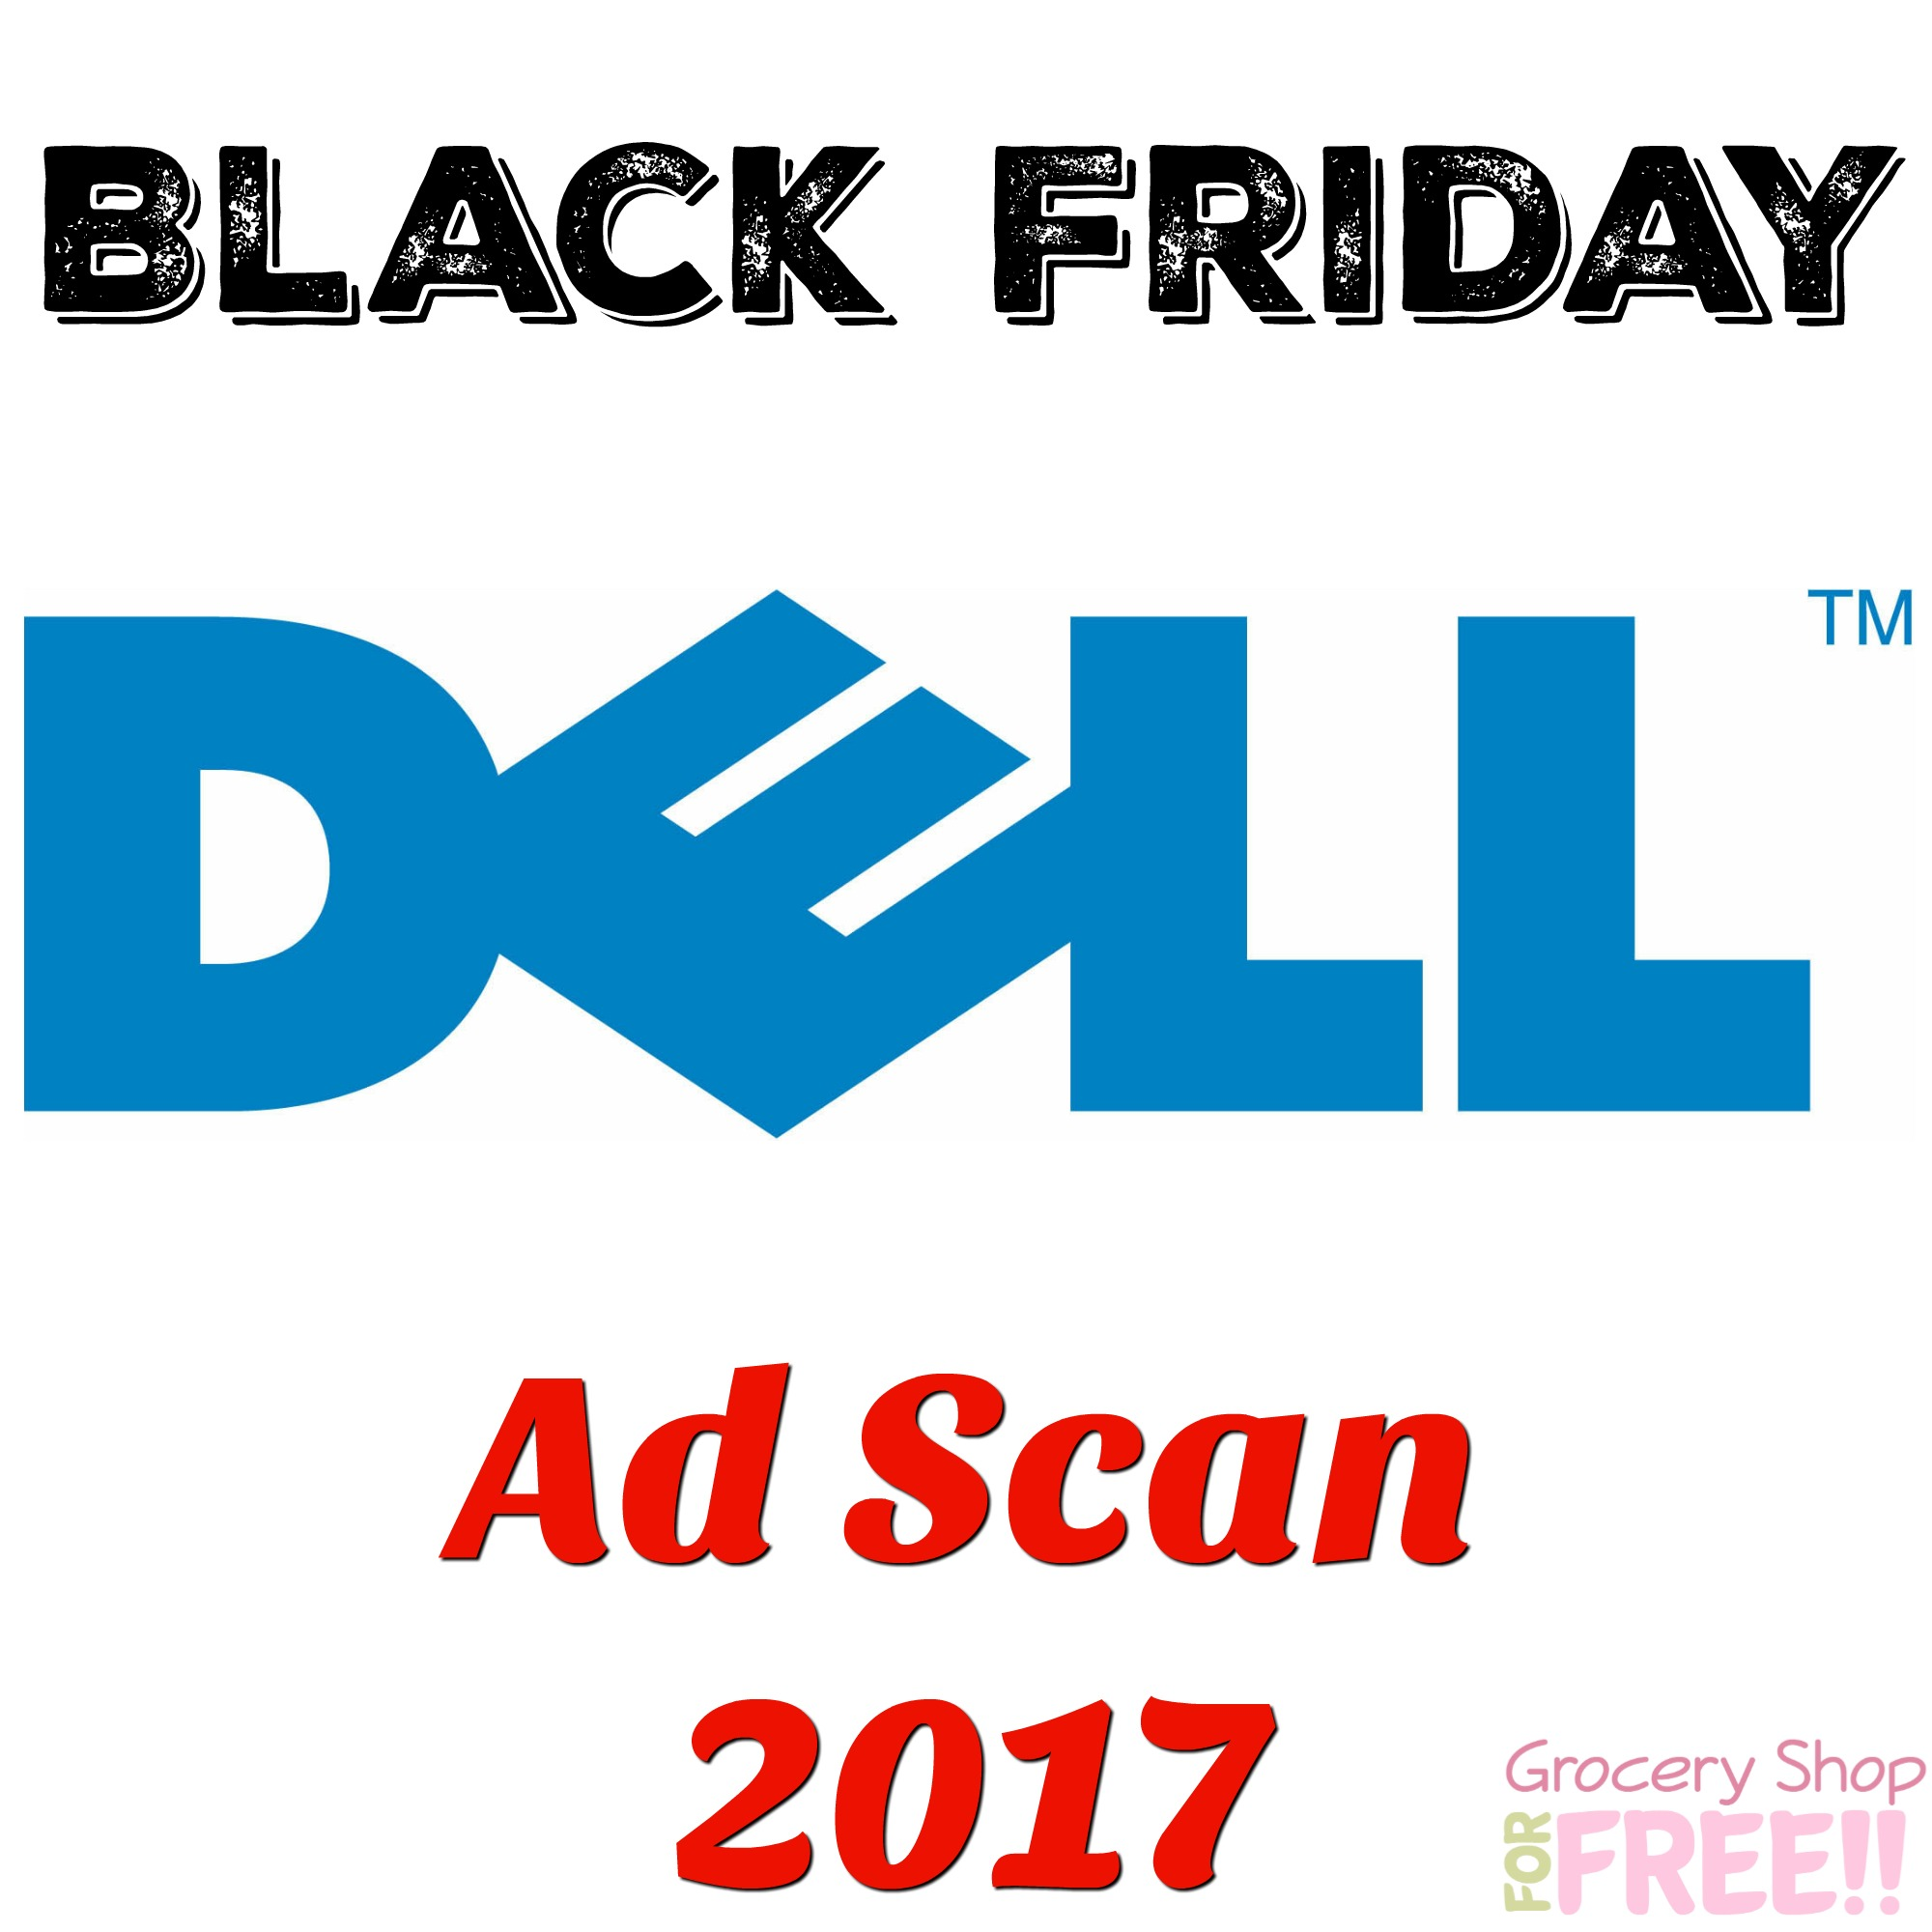 Dell Black Friday Ad 2017 Scan!